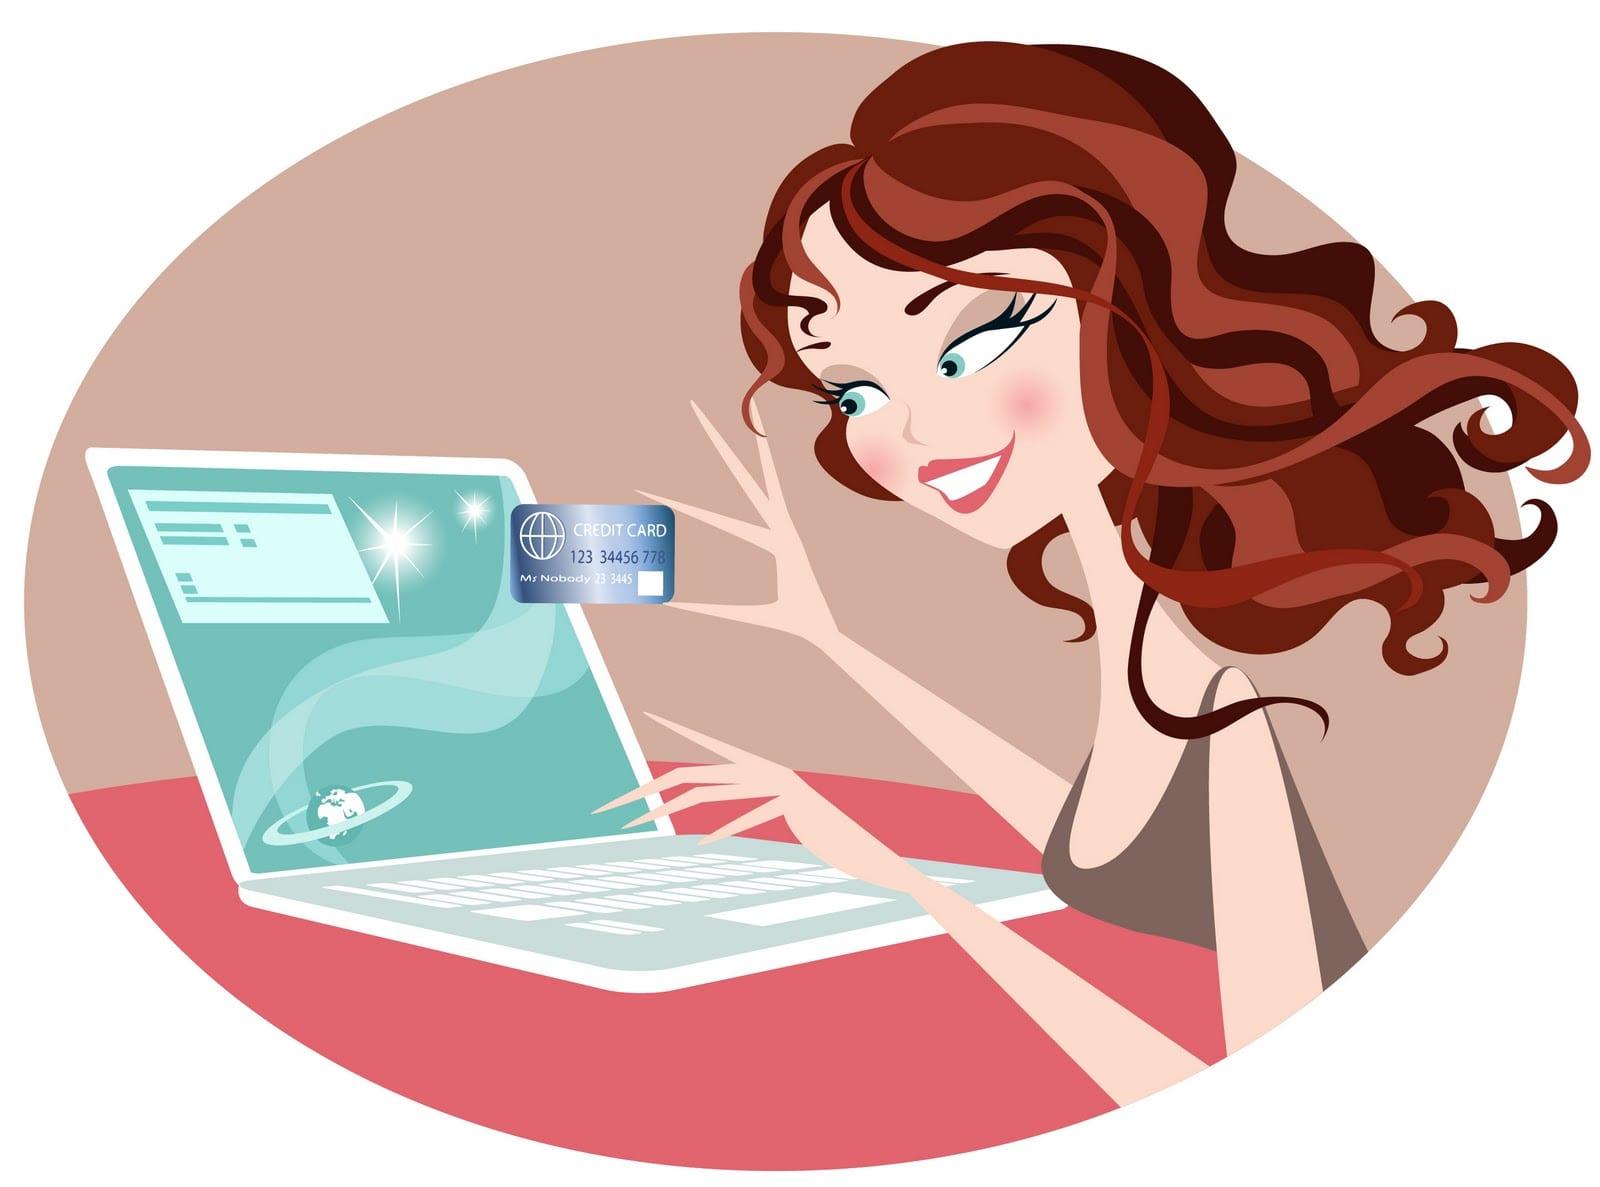 Resultado de imagen para girls buying online